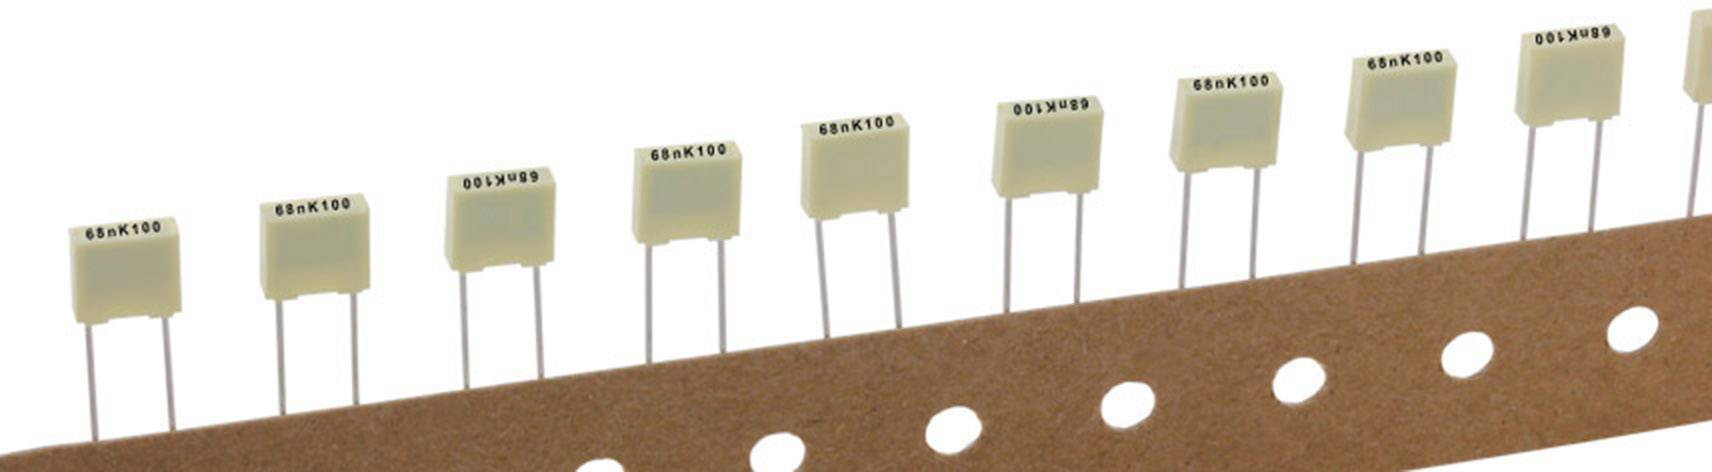 Polyesterový kondenzátor Kemet R82EC2100DQ50K+ radiální, 10 nF, 100 V,10 %, 5 mm, (d x š x v) 7.2 x 2.5 mm x 6.5 mm, 1 ks